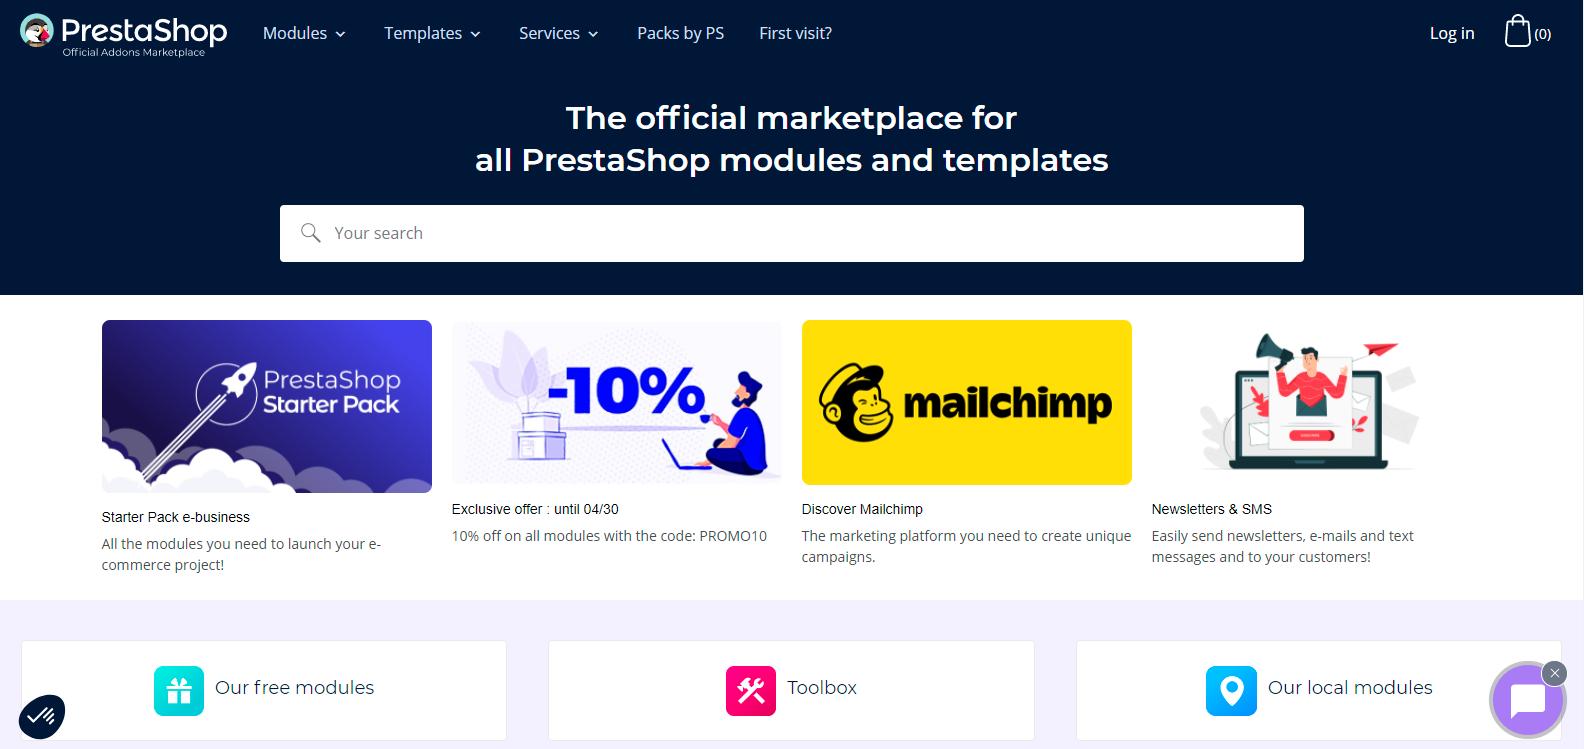 PrestaShop's Add-ons Marketplace